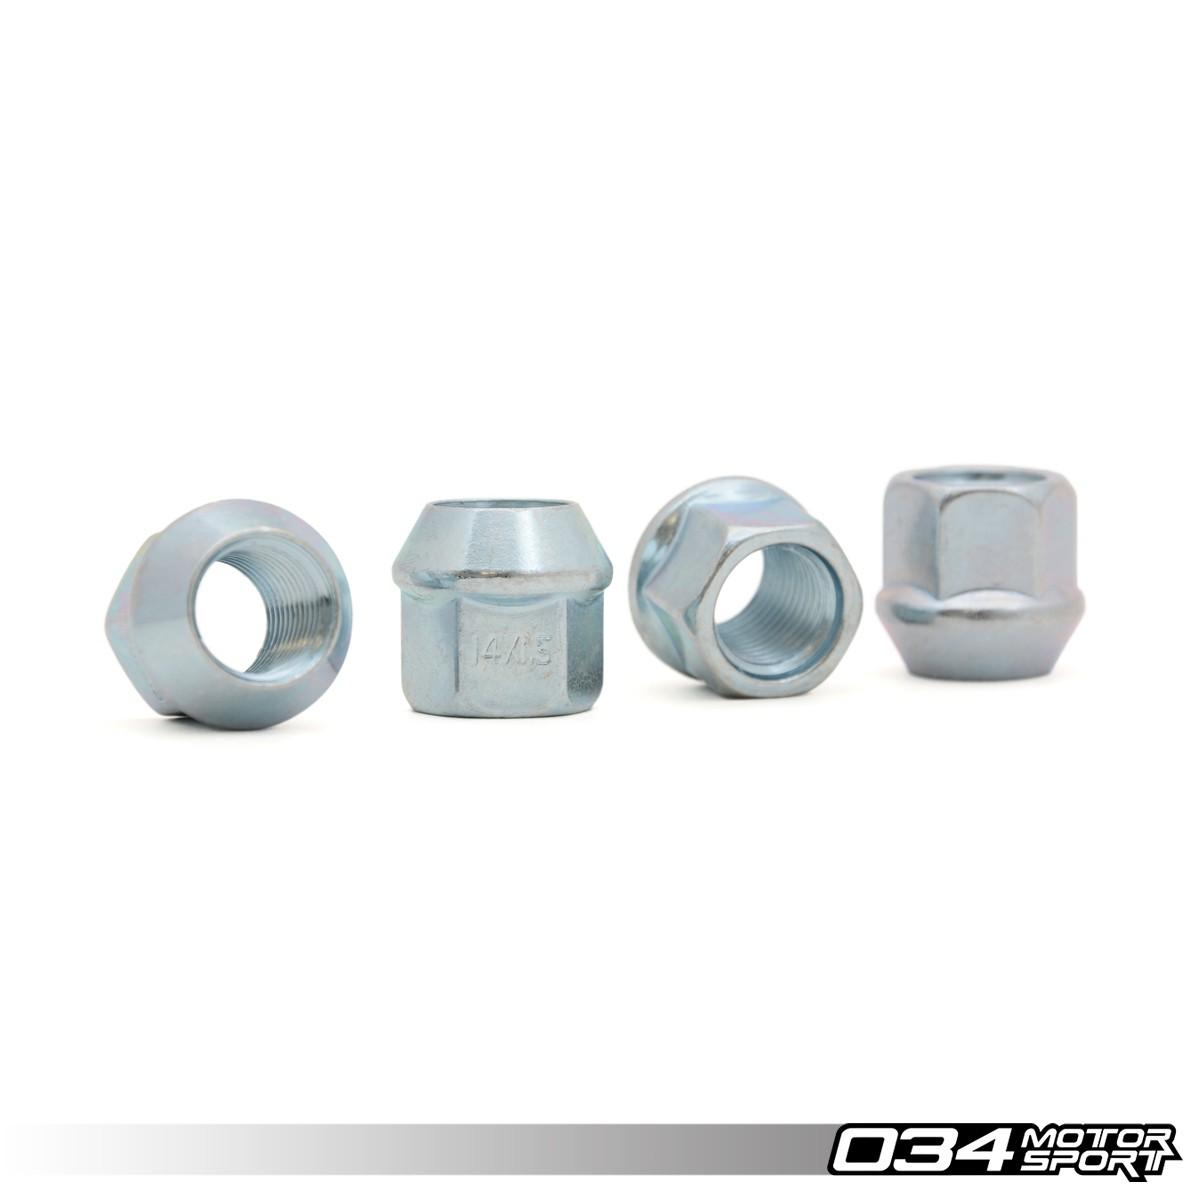 Wheel Nut, Cone Seat, M14x1.5 | 034-604-1003